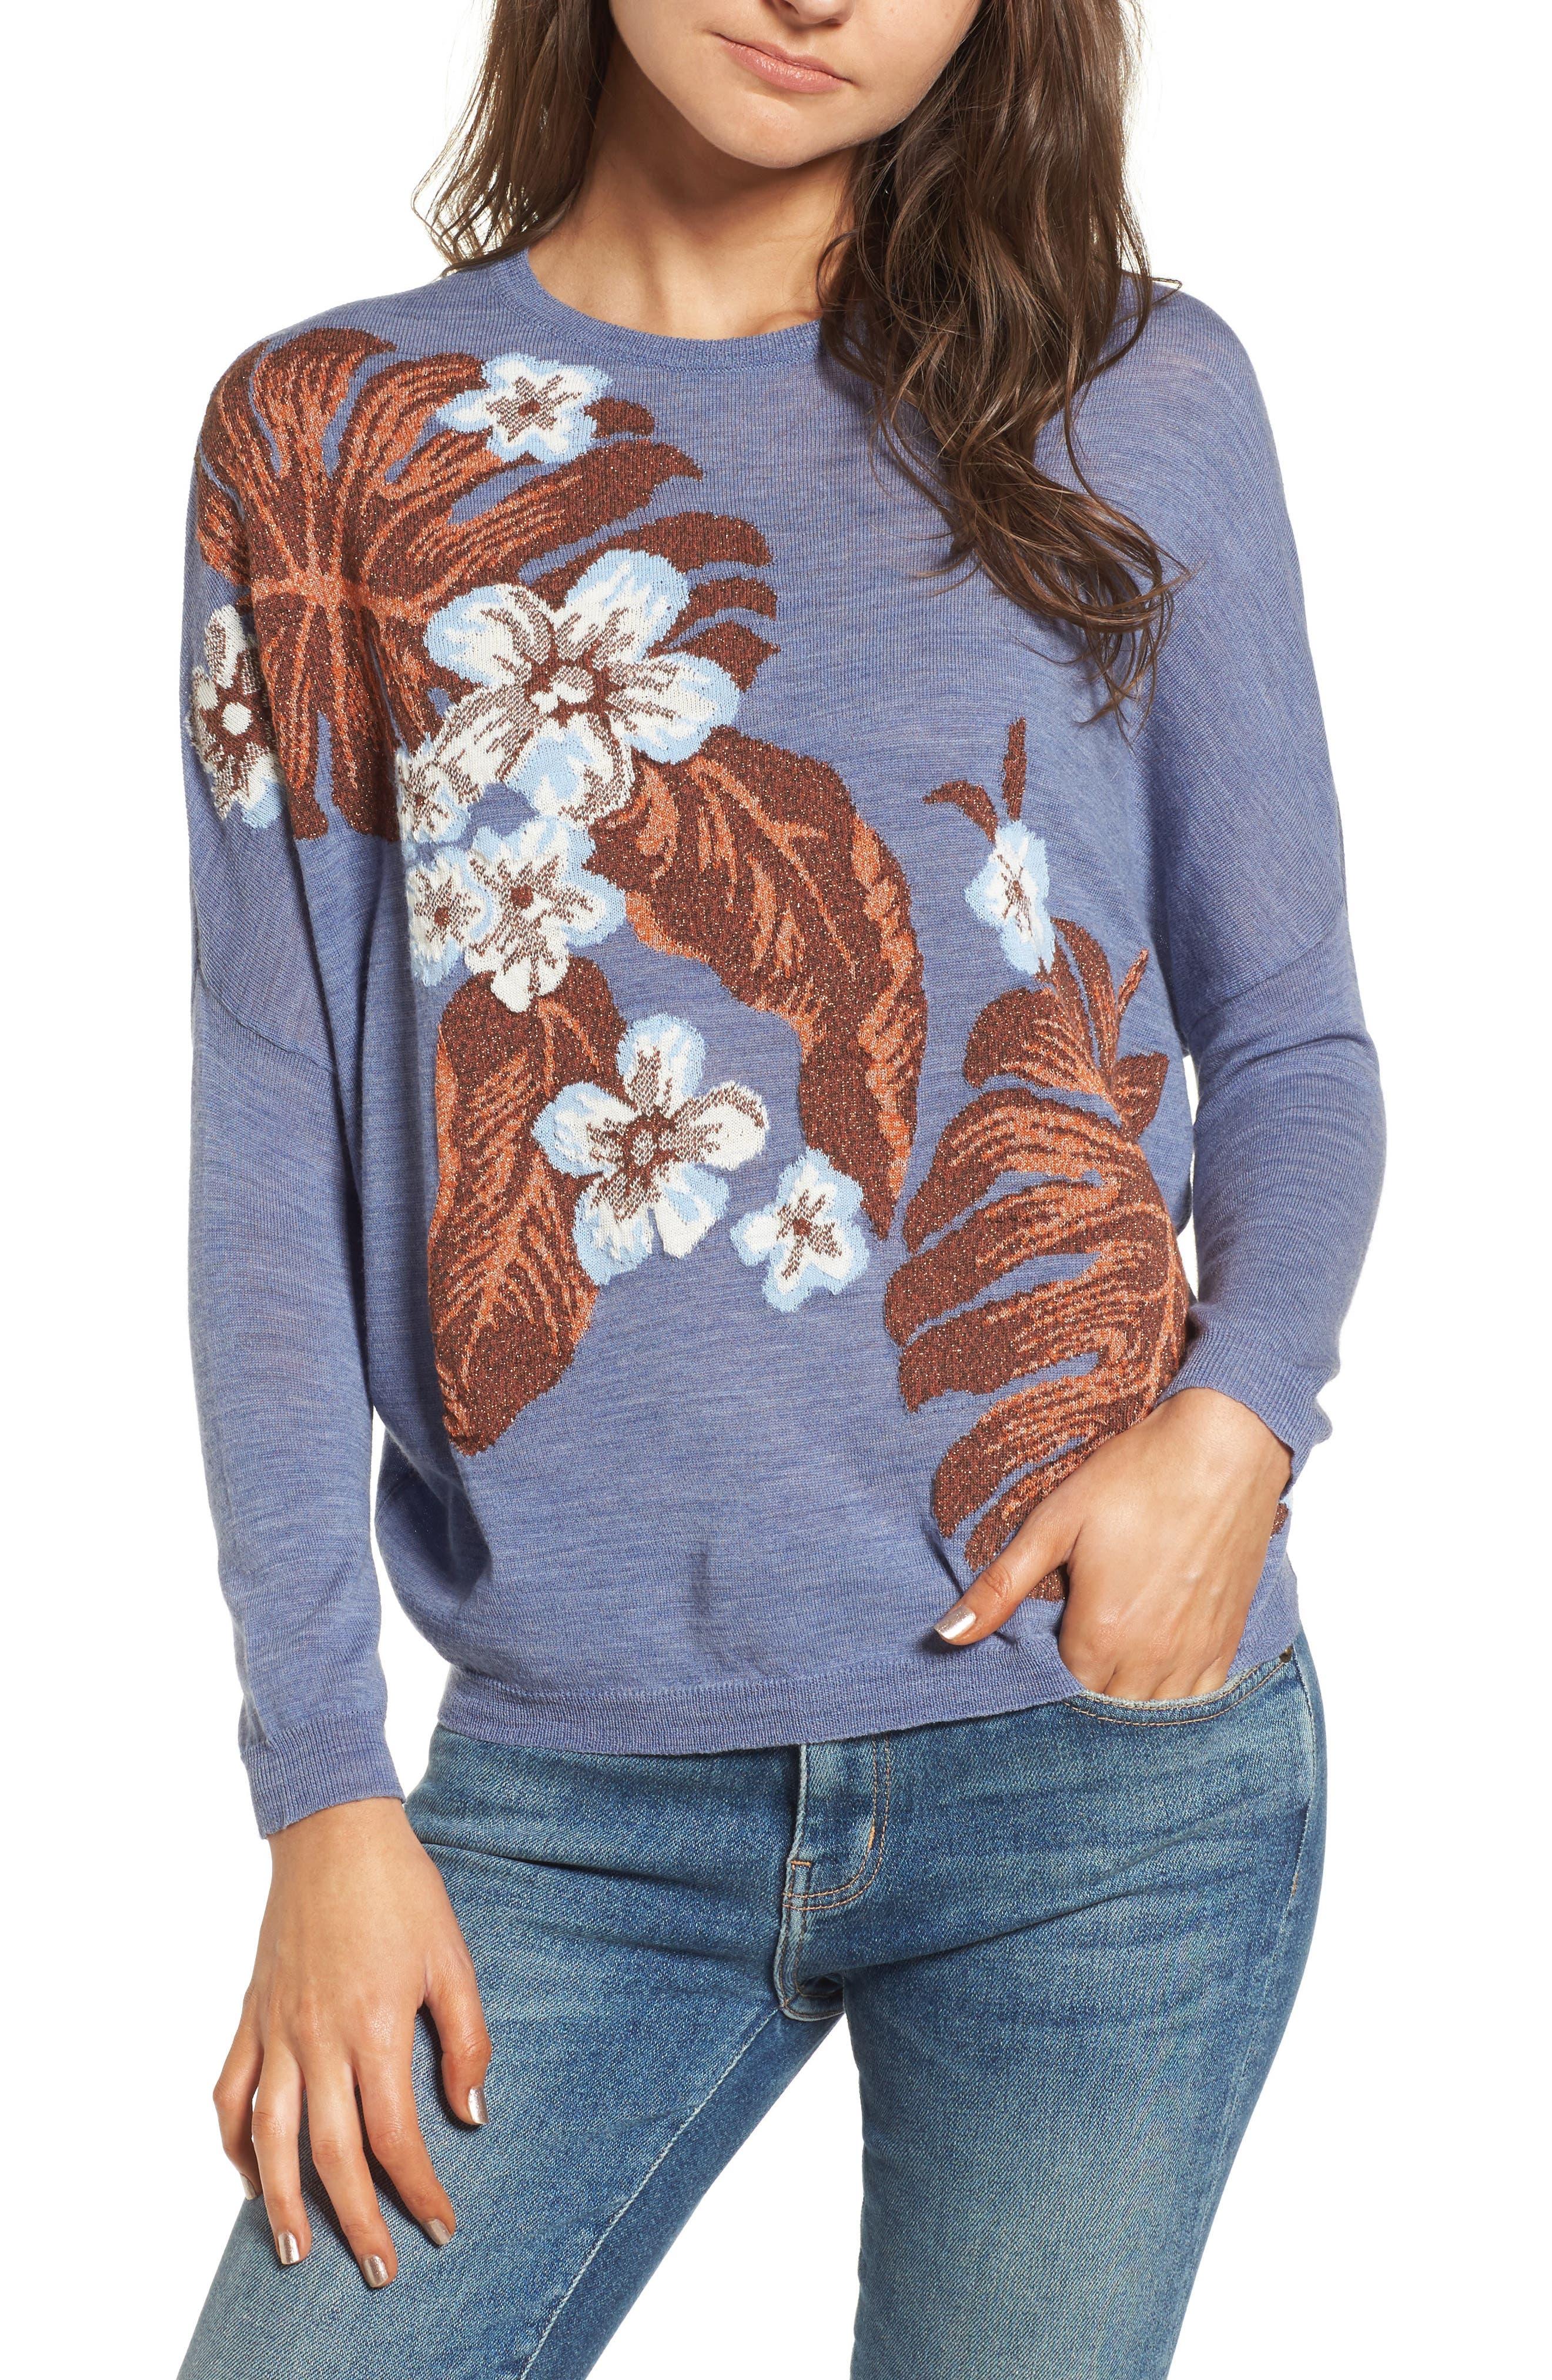 Blupalm Sweater,                         Main,                         color, Denim